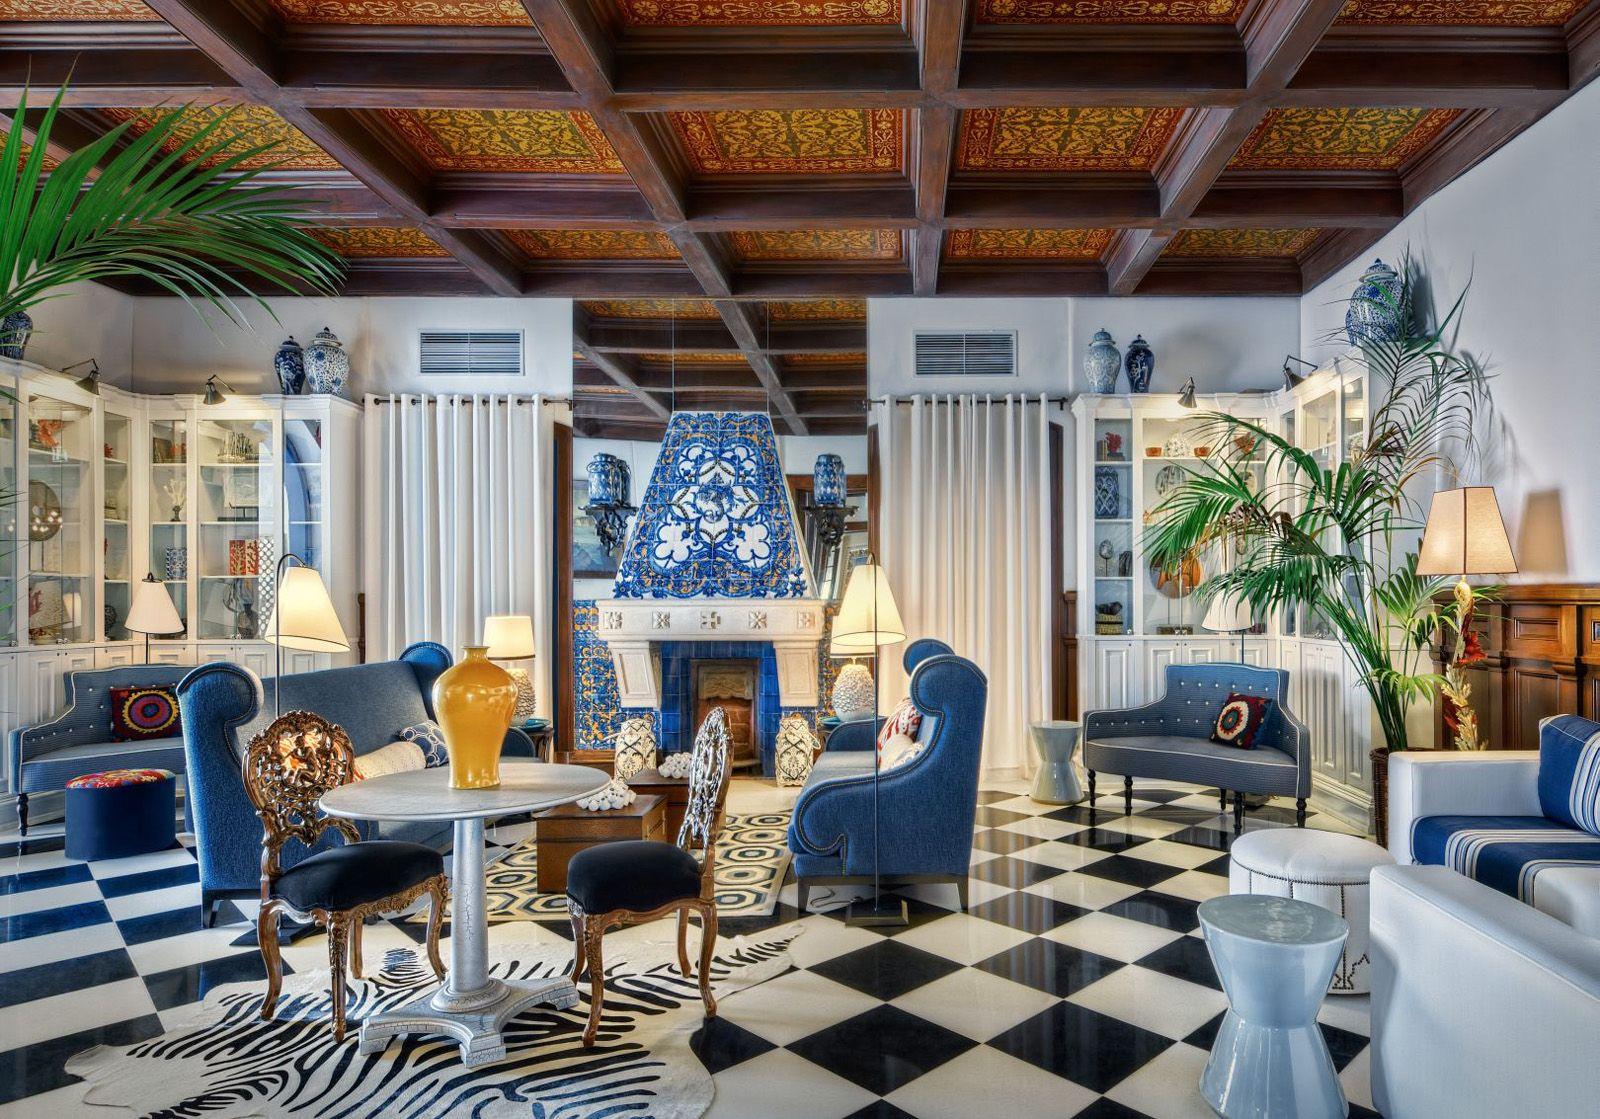 portuguese interior designer graça viterbo directed the renovation